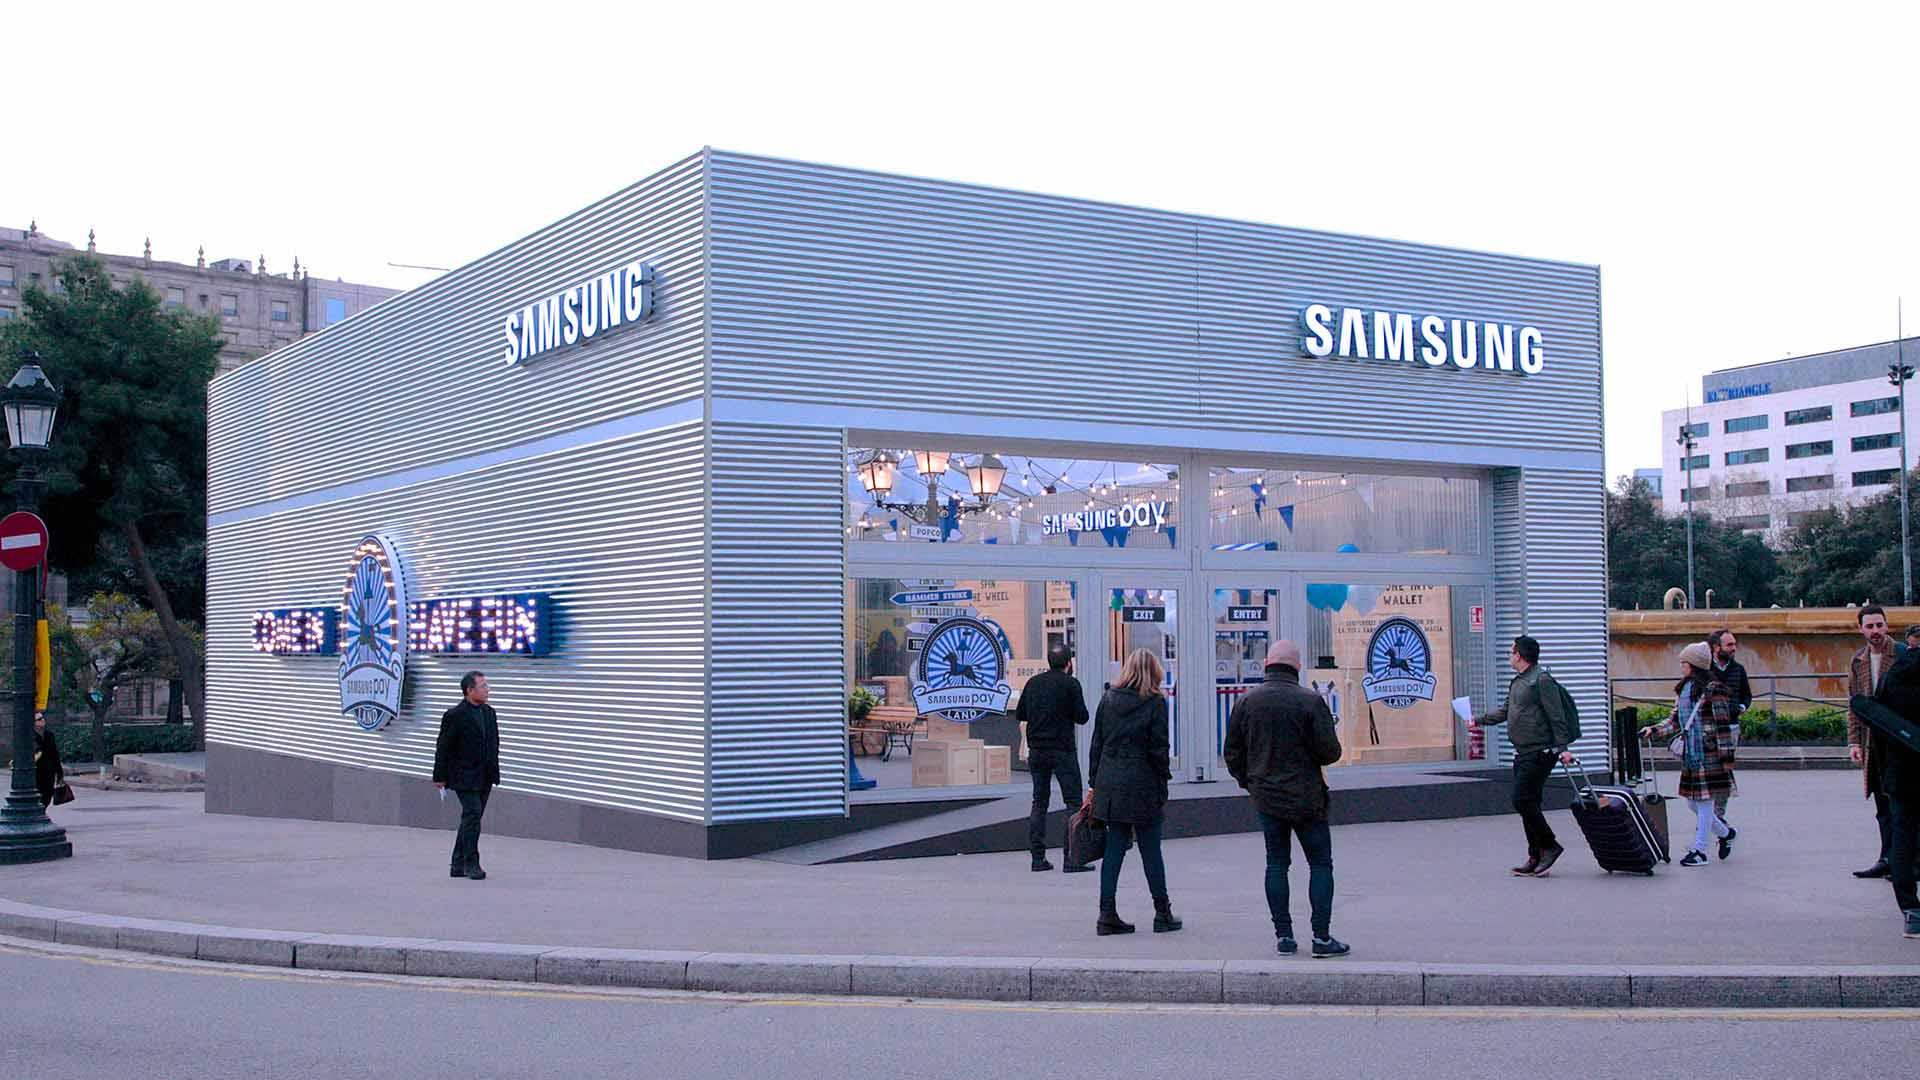 Samsung Pay pop up. Installation pop up